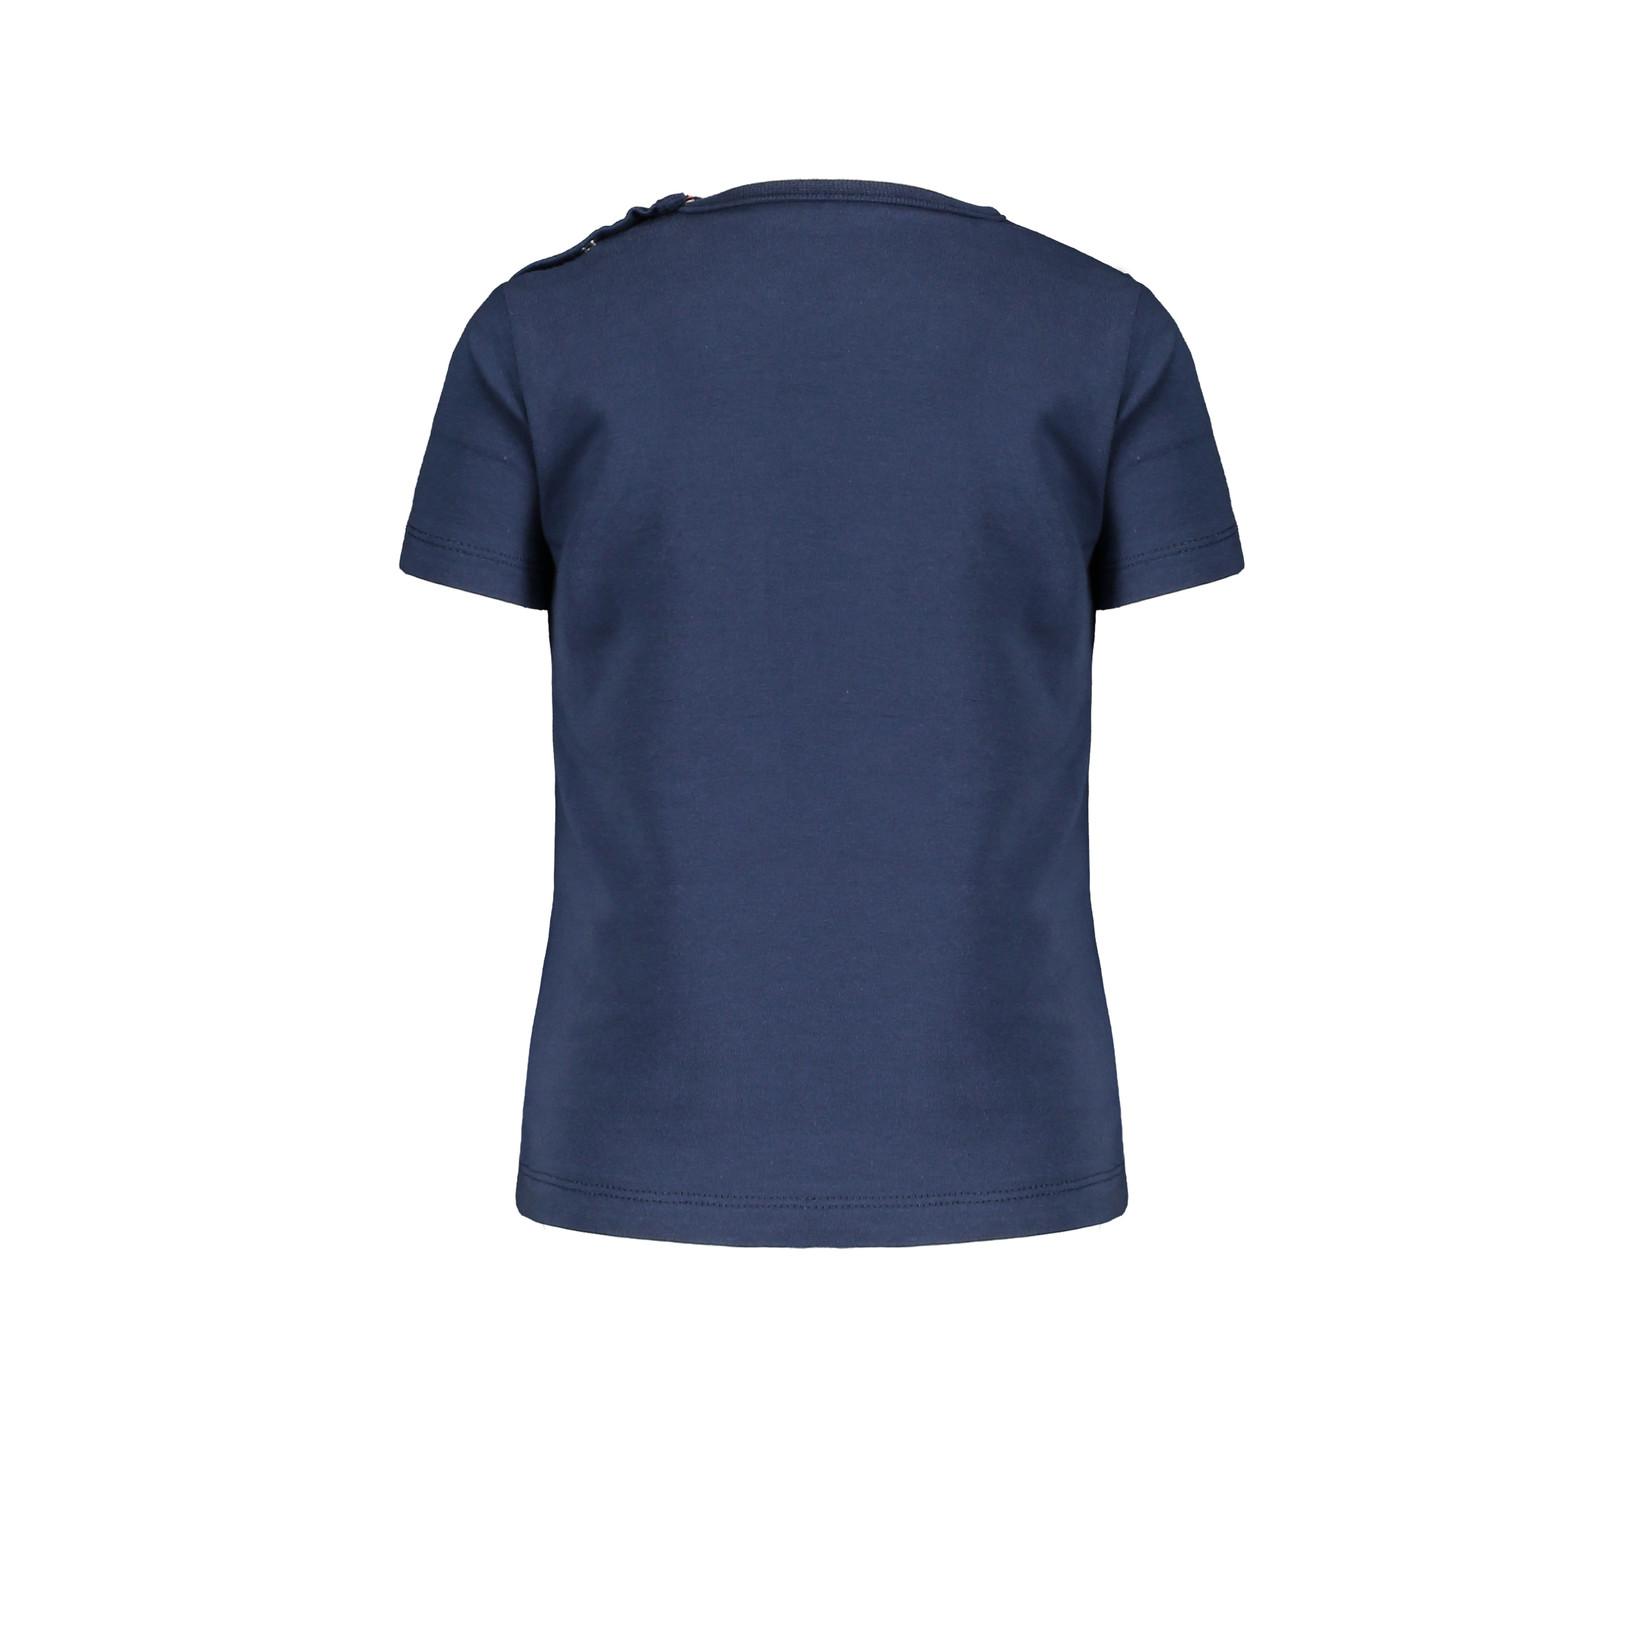 Bampidano Little Bampidano Boys short sleeve T-shirt Dex plain with print PLAY